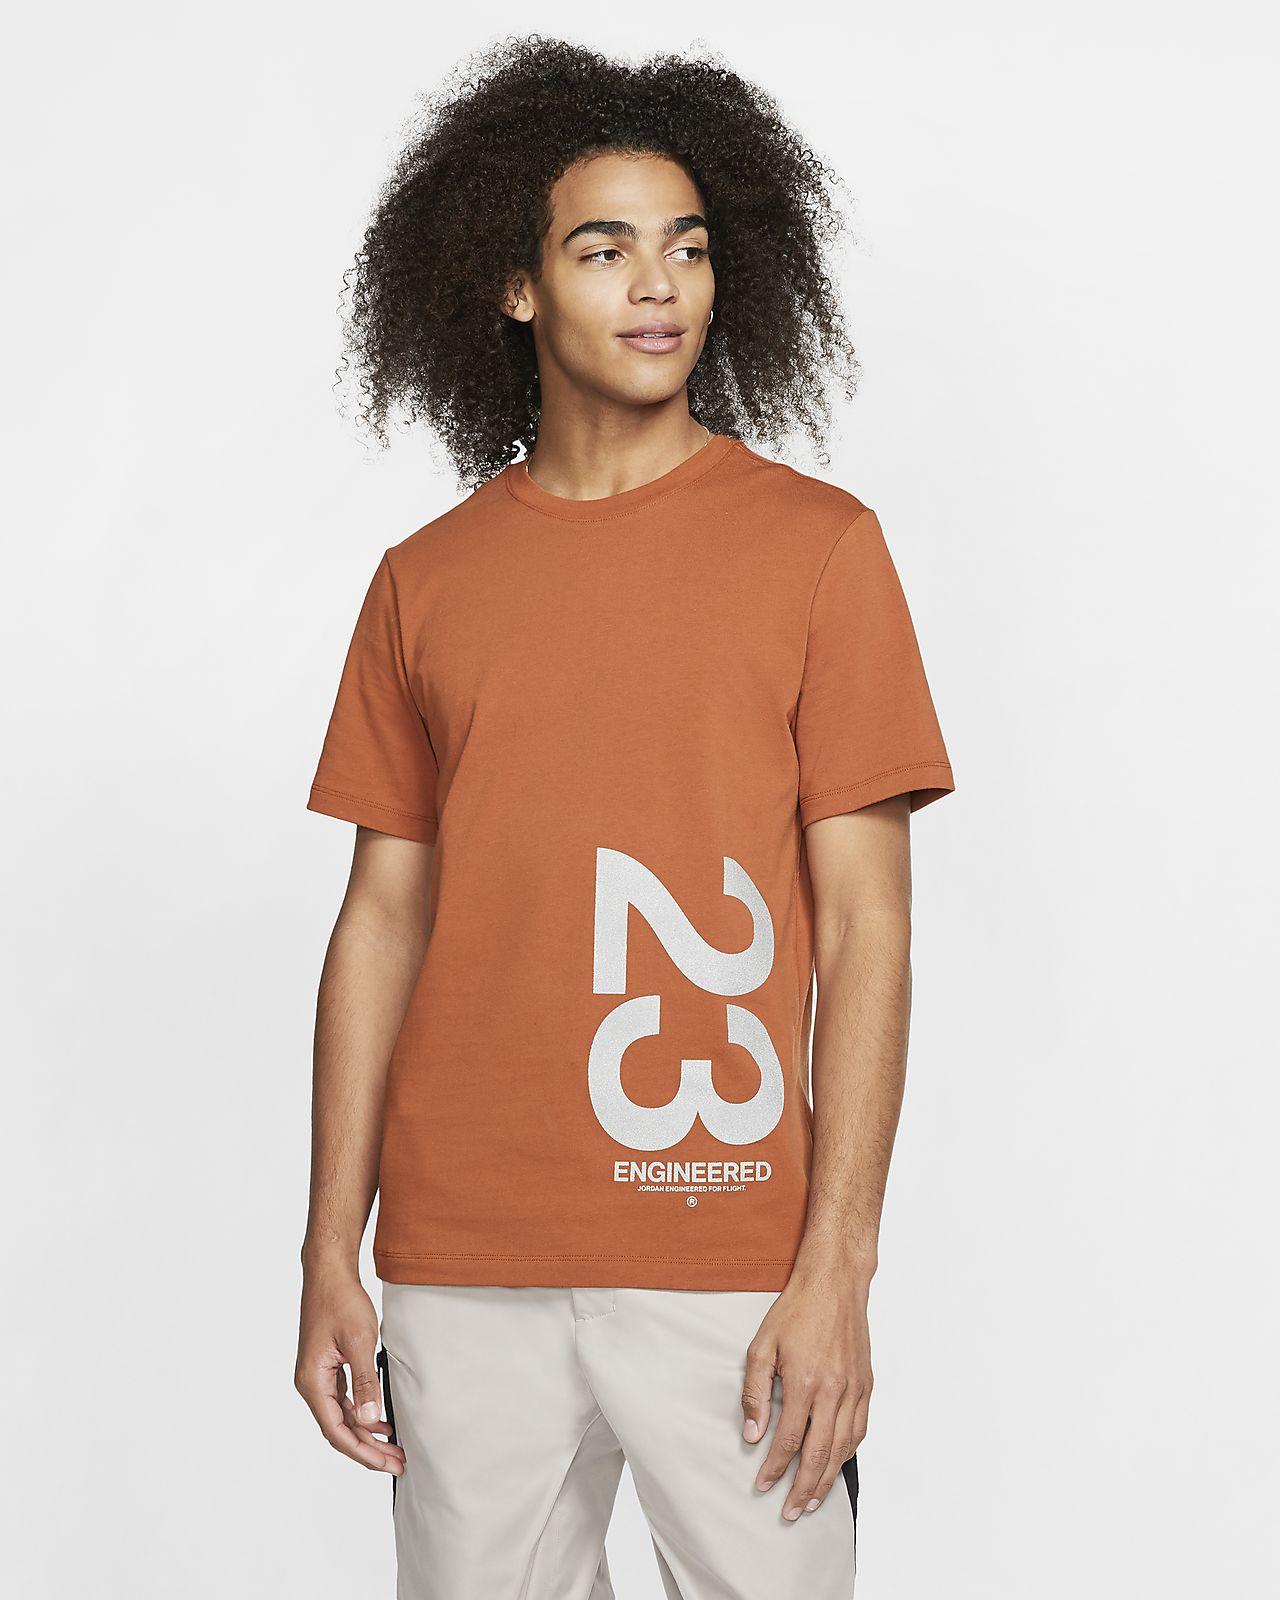 Jordan 23 Engineered-T-shirt